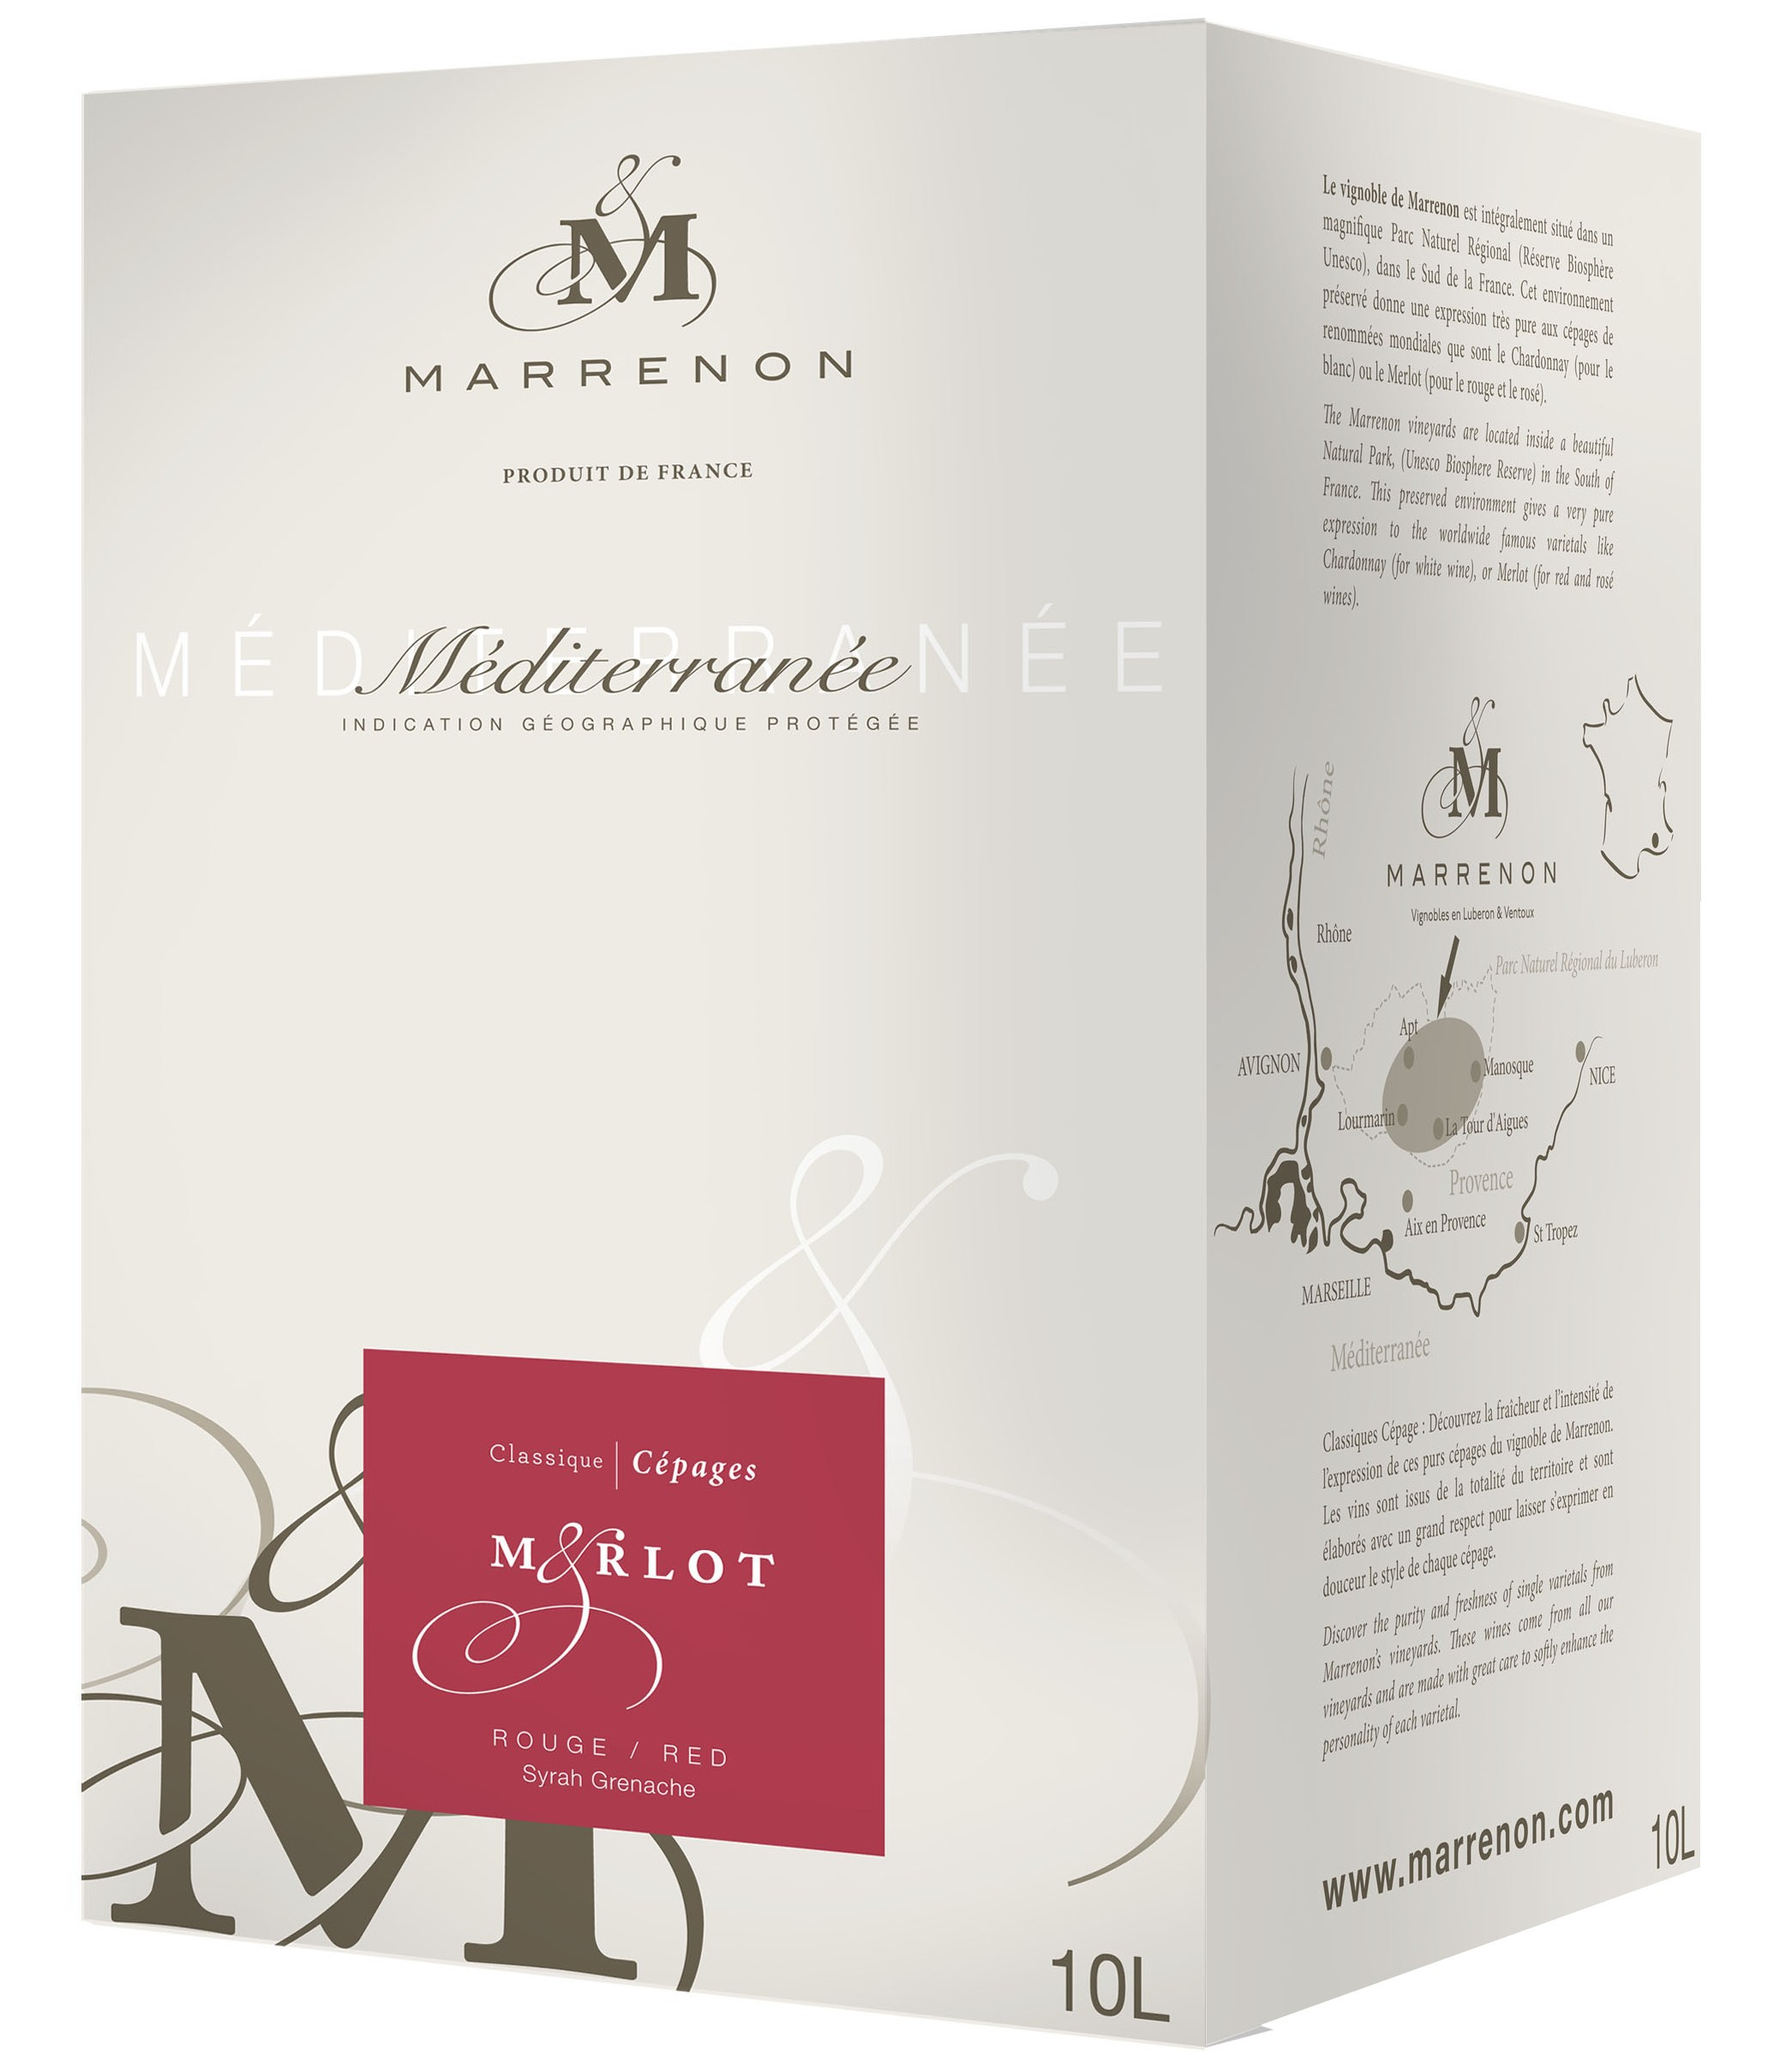 Marrenon - Merlot IGP, bag in Box, 10l